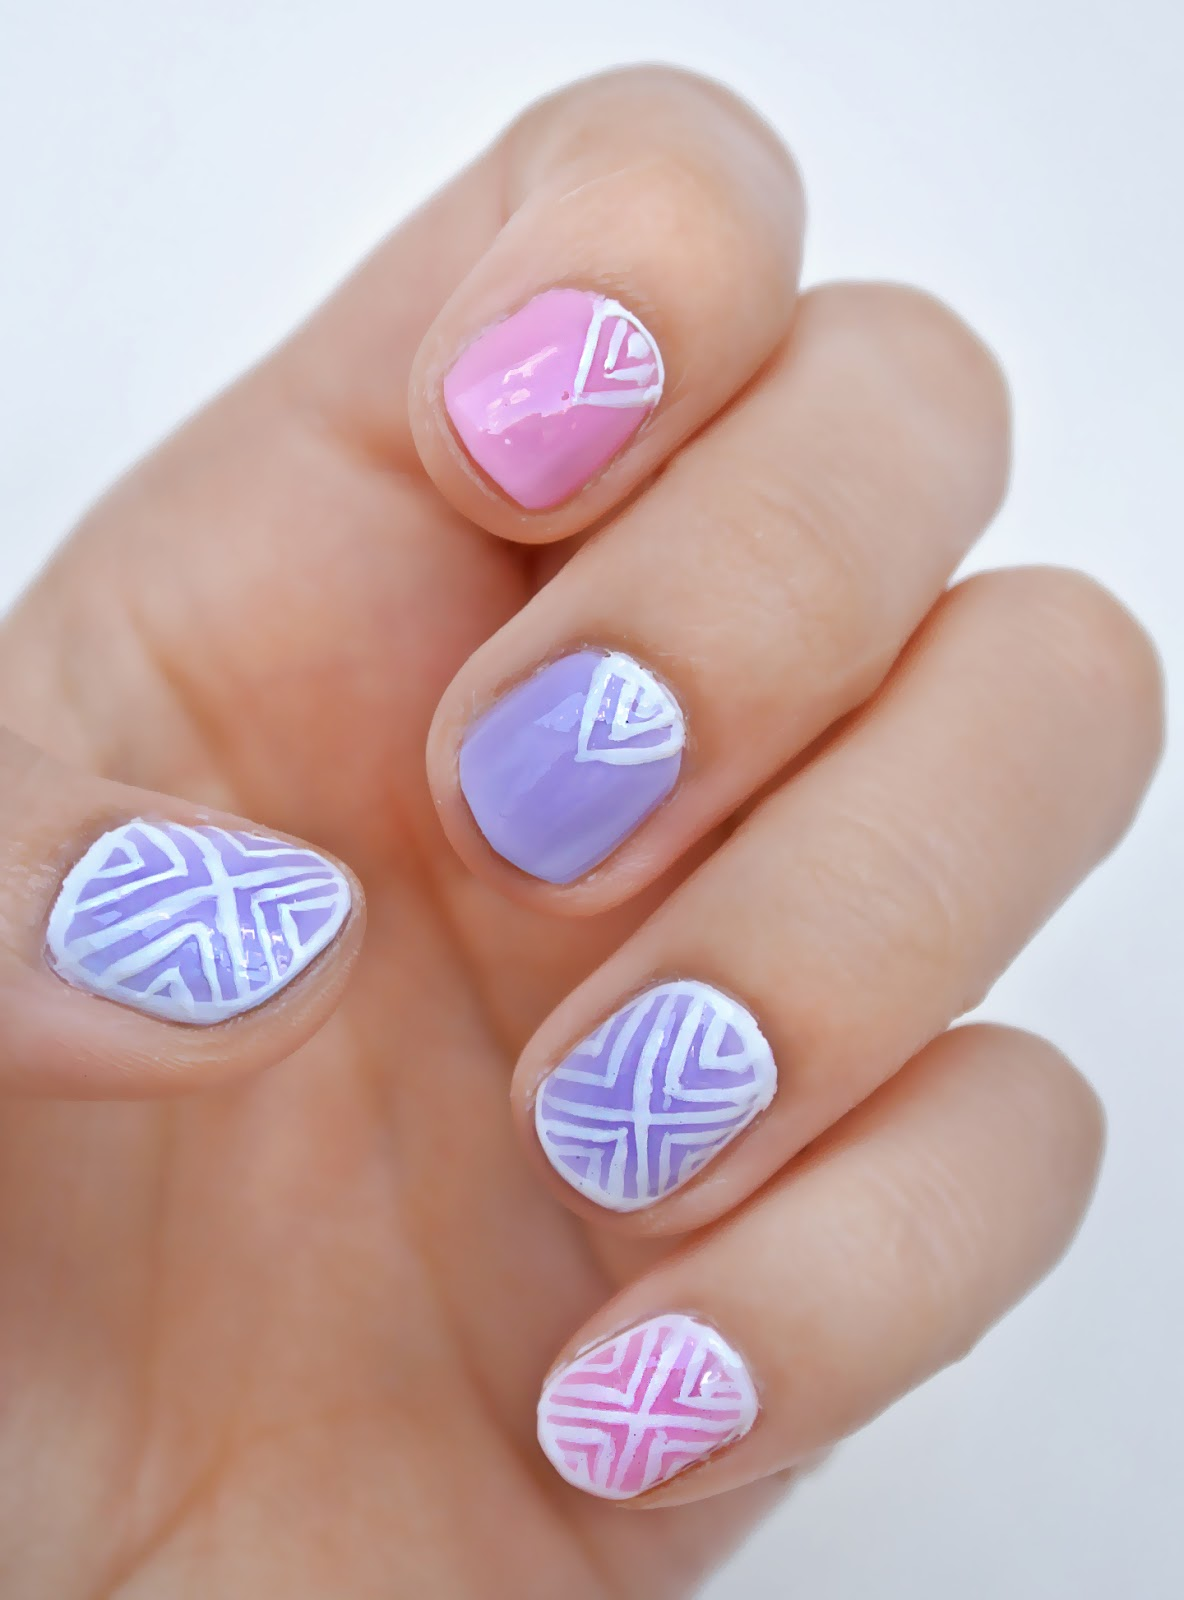 Simple Line Nail Art : Simple nail art line designs joy studio design gallery